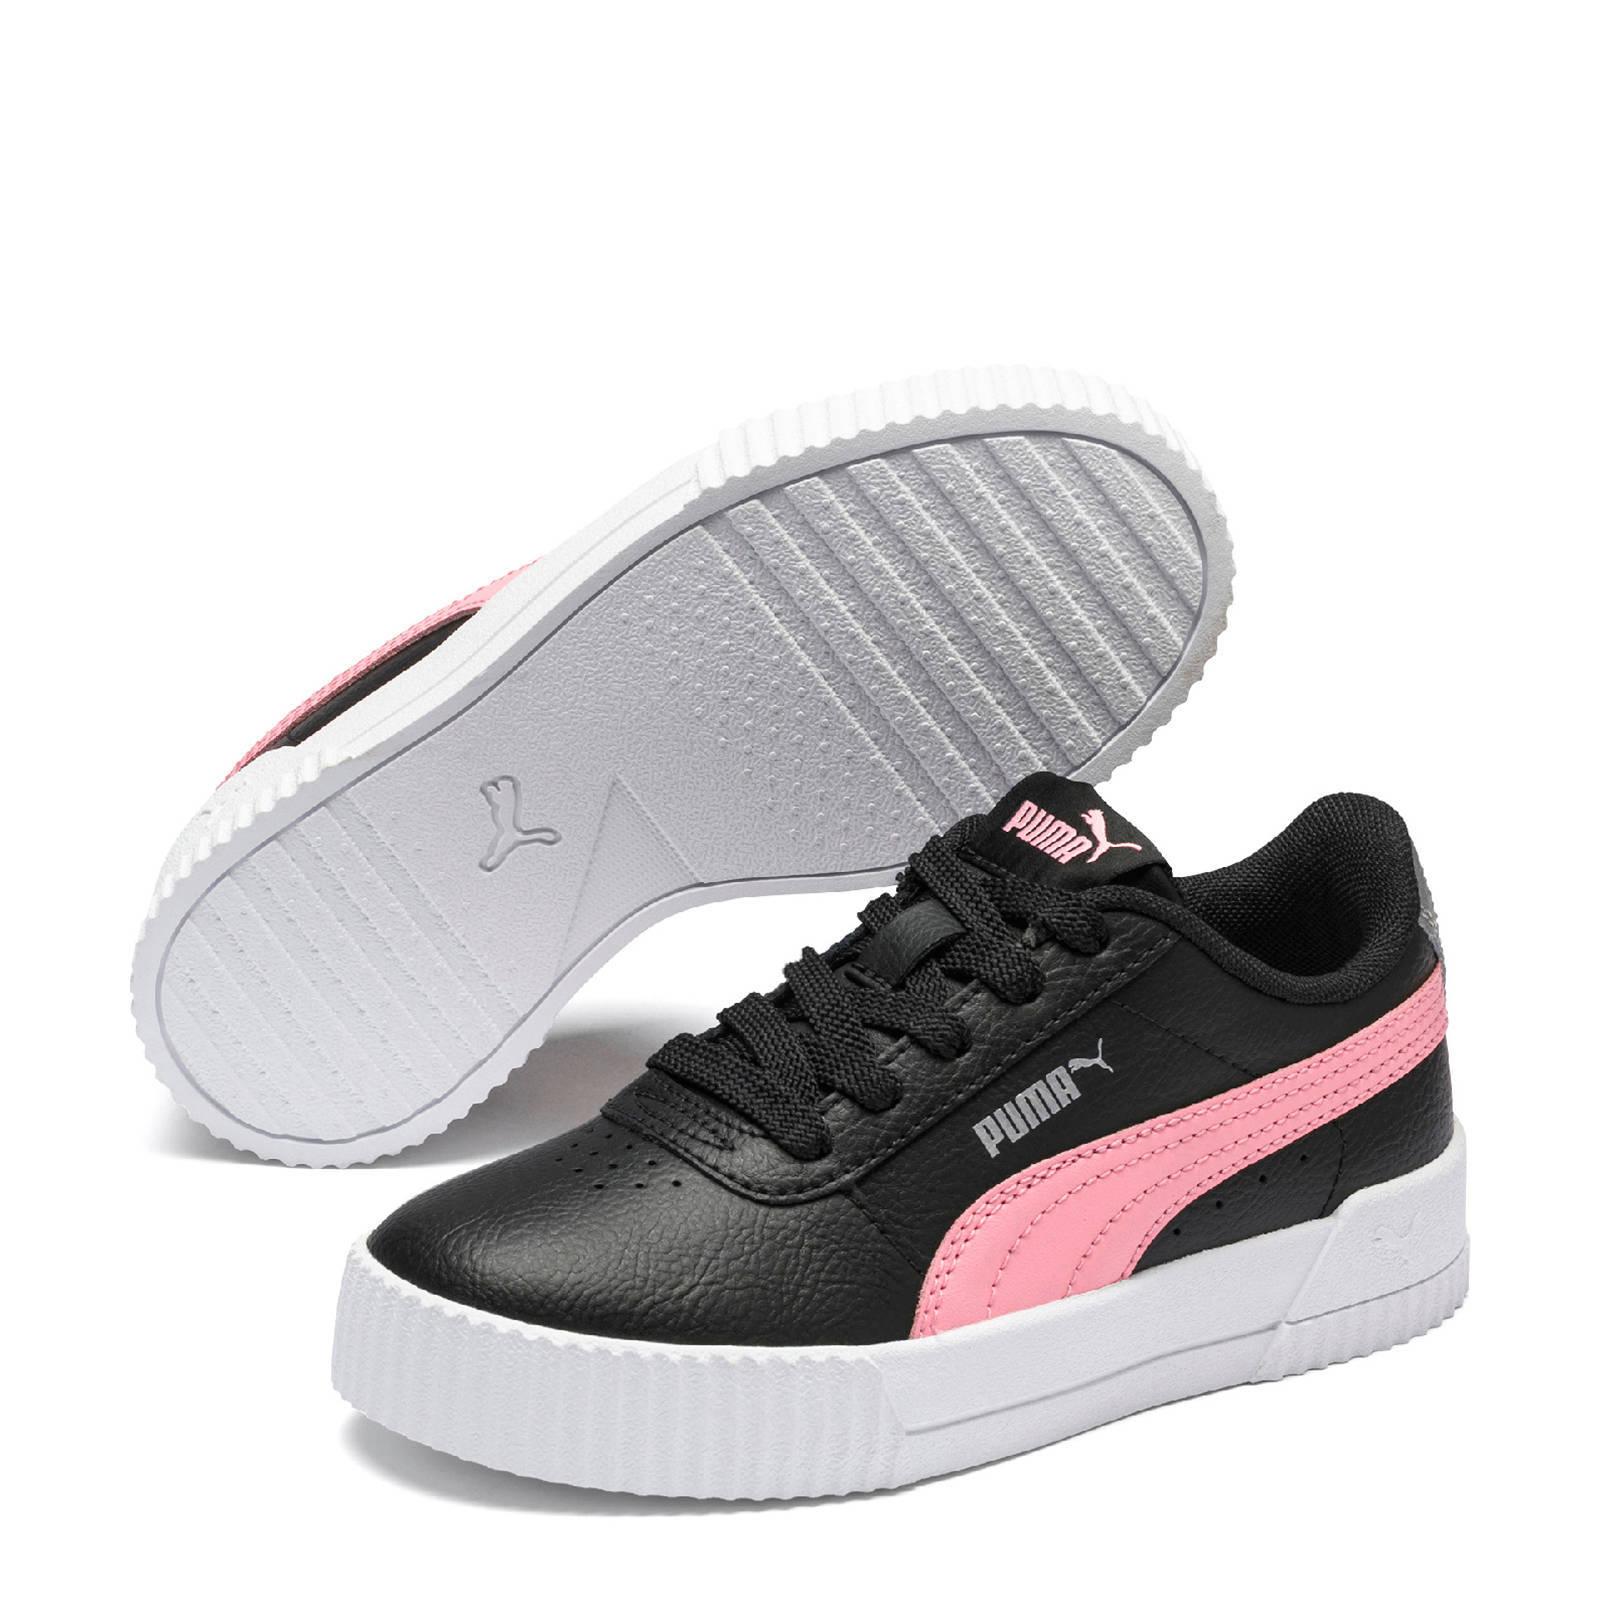 Puma Carina L PS sneakers zwart/roze/zilver | wehkamp